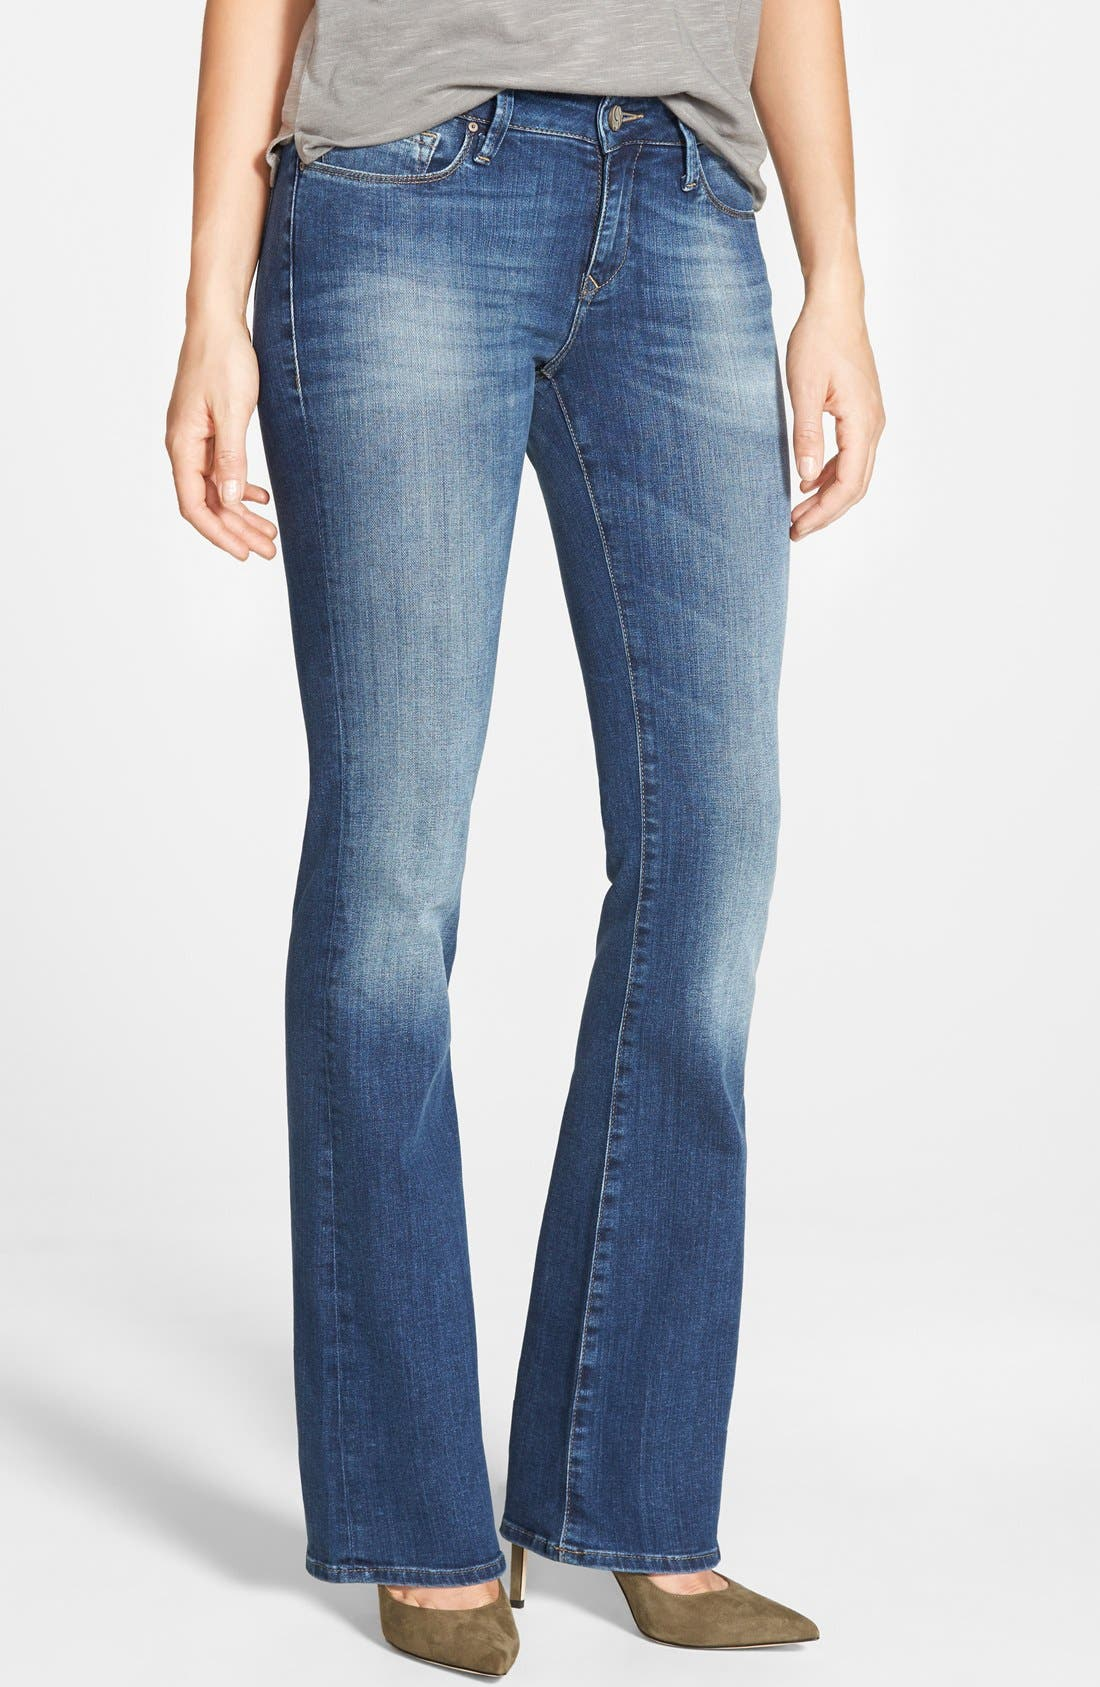 Mavi Jeans 'Ashley' Stretch Bootcut Jeans (Tribeca) (Regular & Petite)